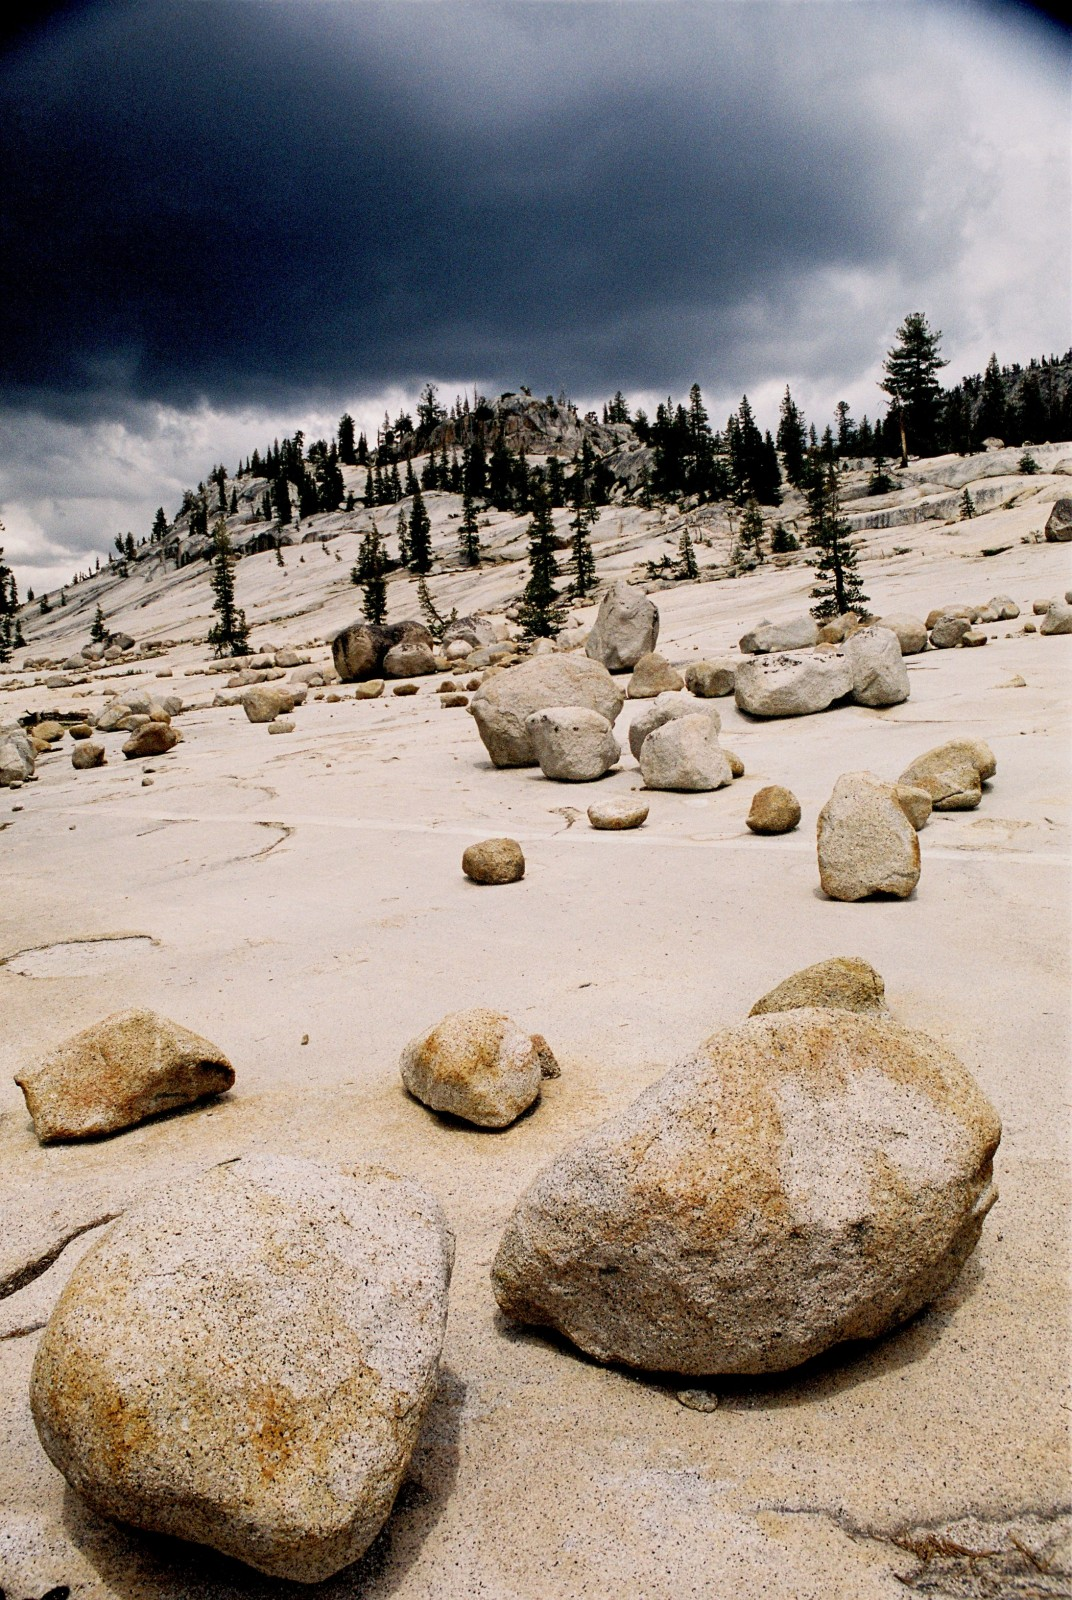 Glacial erratic rocks . Credit: Yuval Sadeh (distributed via imaggeo.egu.eu)